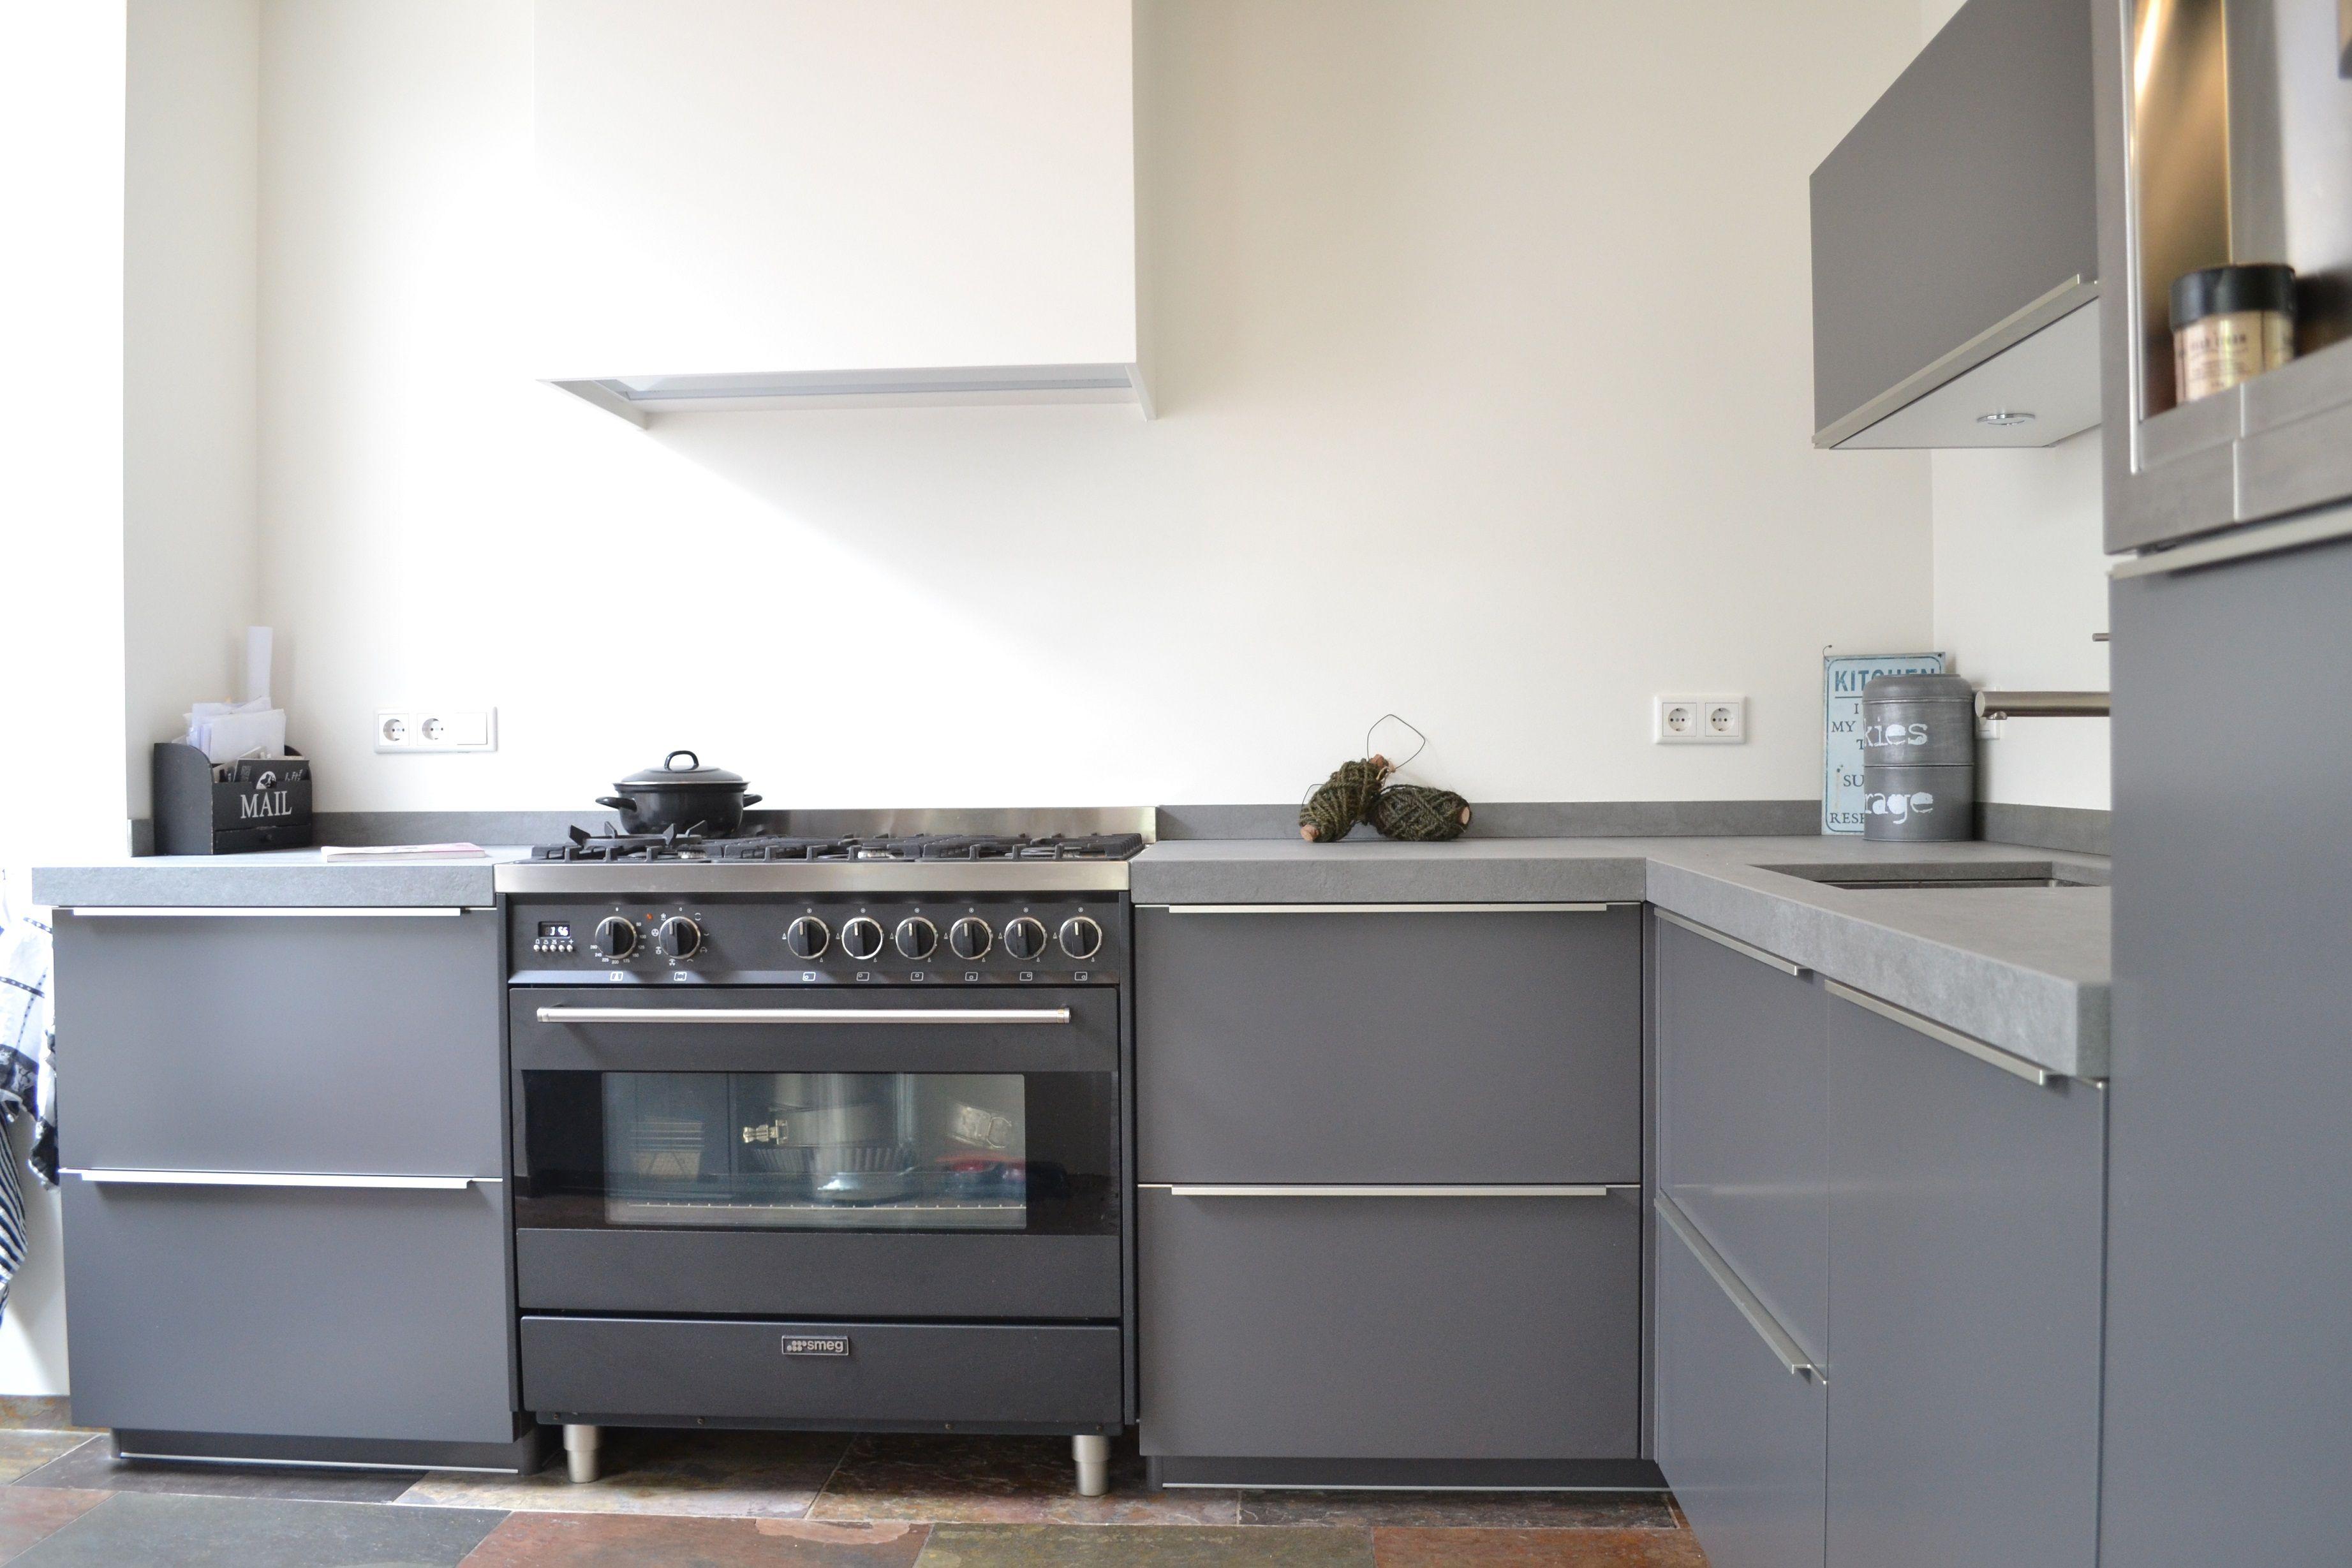 Hoogglans Grijs Keuken : Grijze hoogglans keuken met smeg fornuis strakke keuken